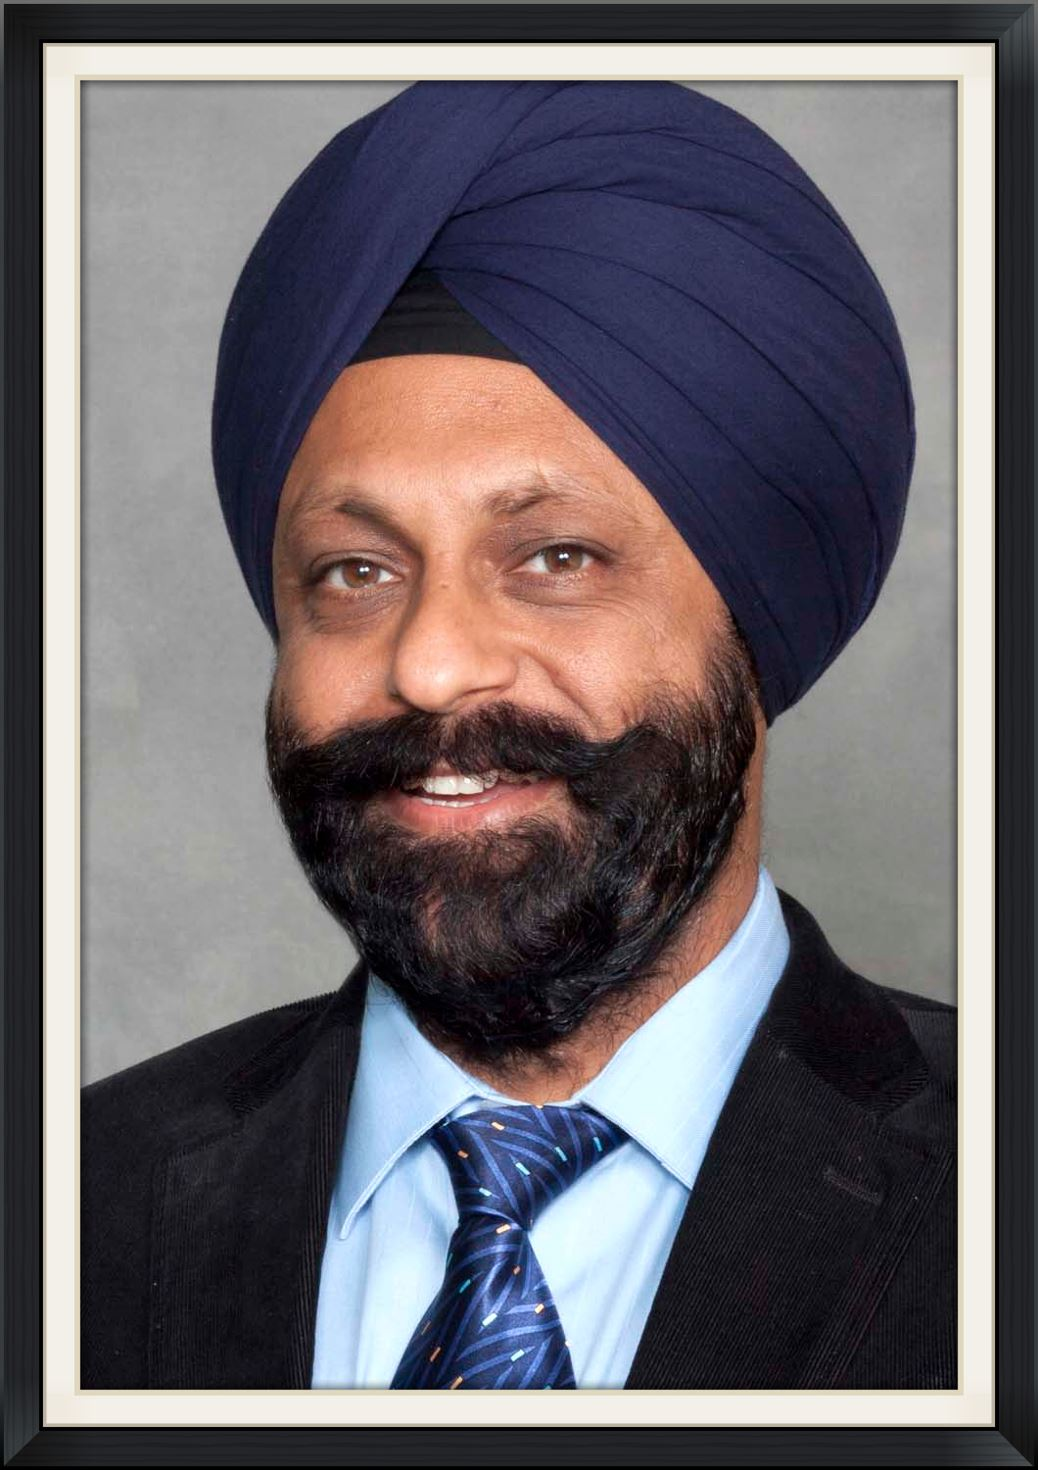 HomeoHealers - Dr.DeepinderSingh